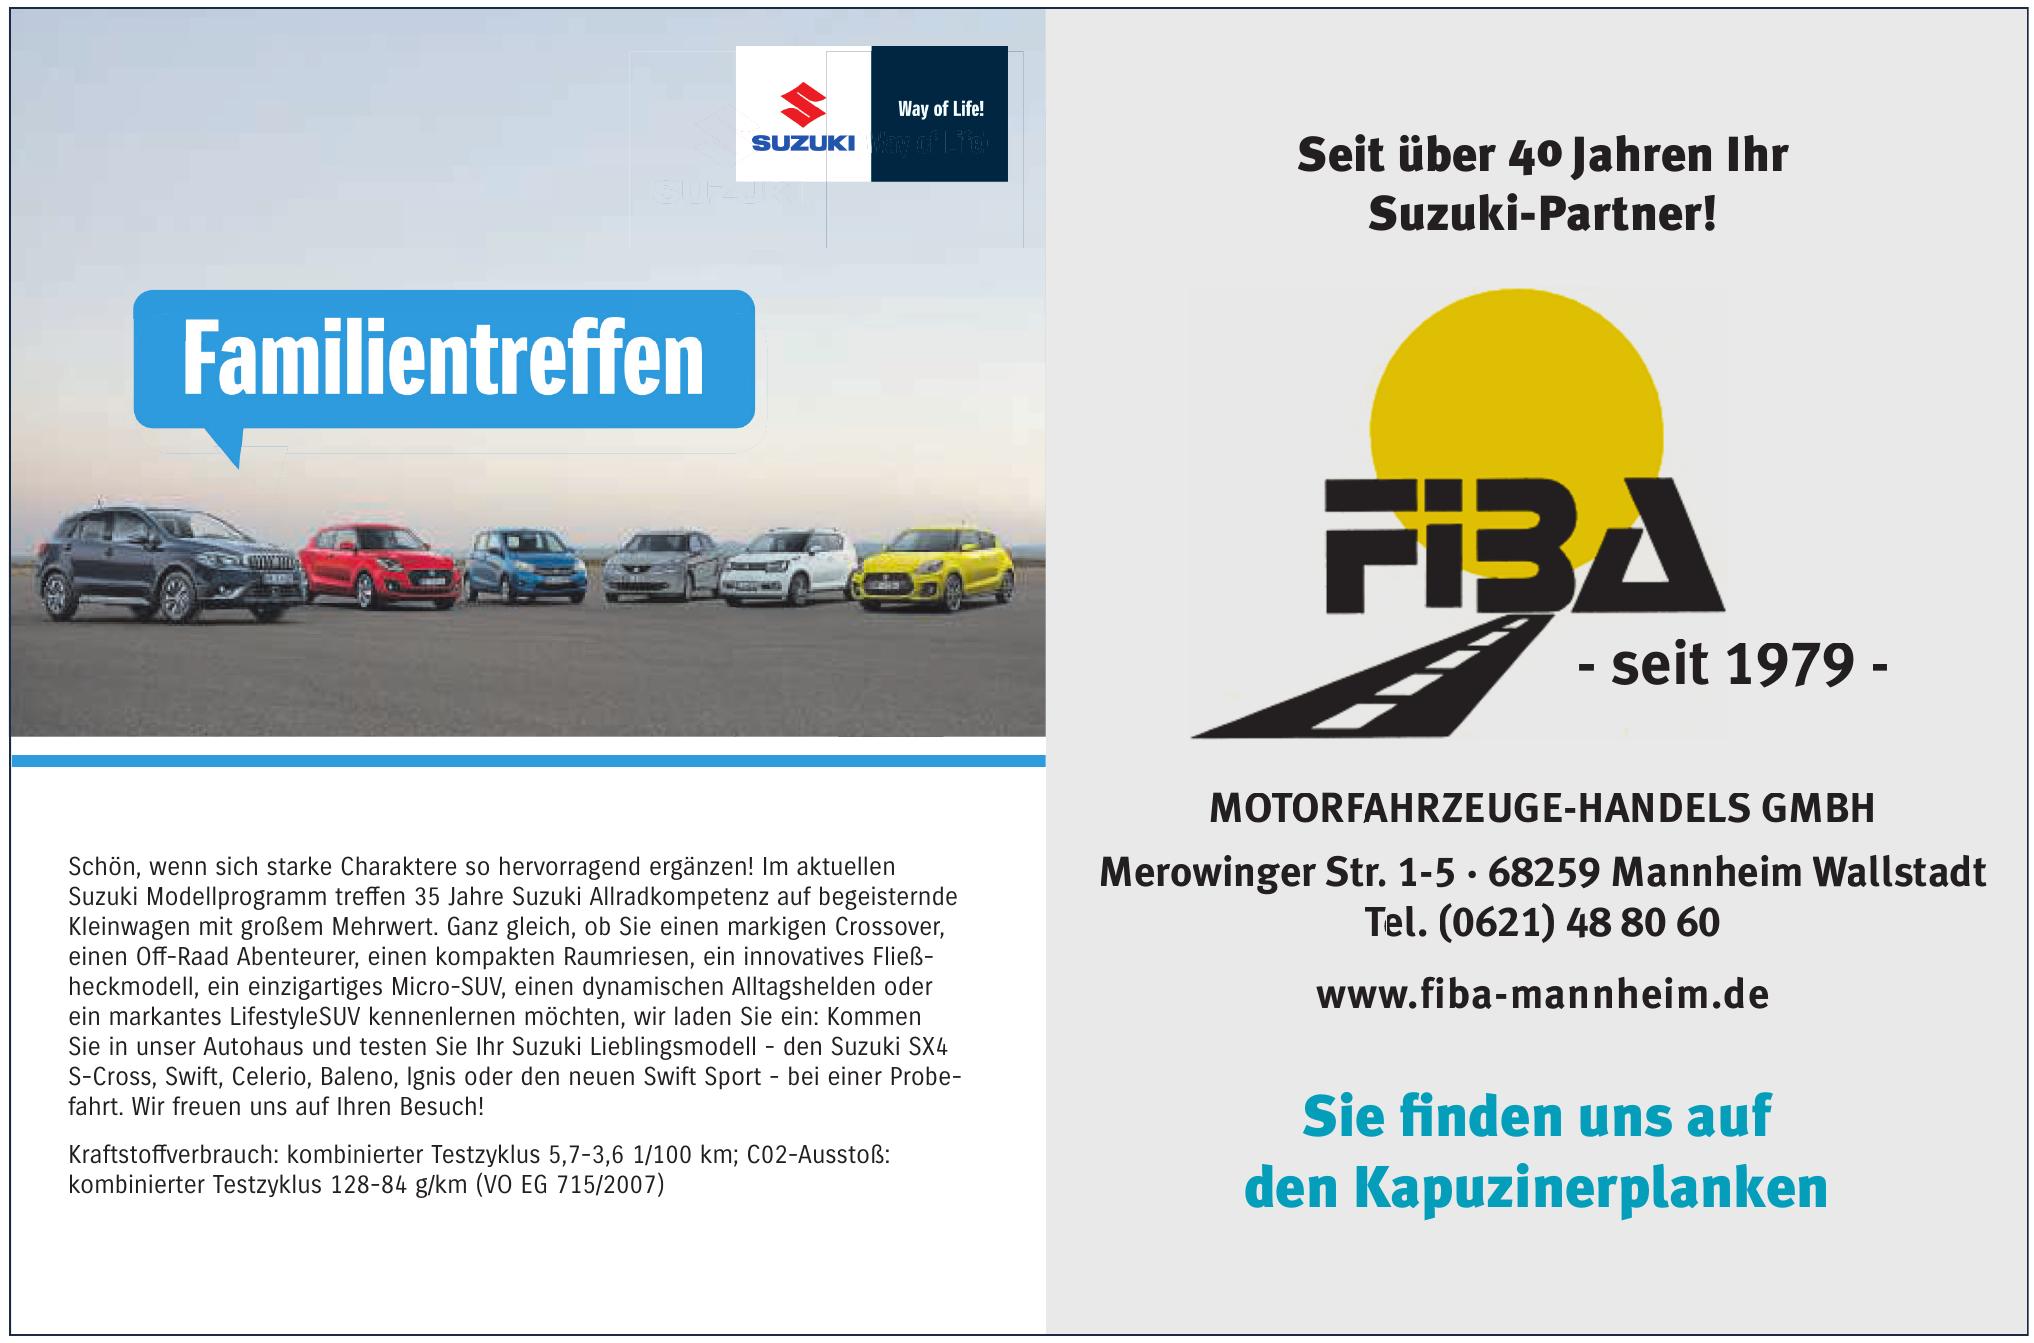 Motorfahrzeuge-Handels GmbH